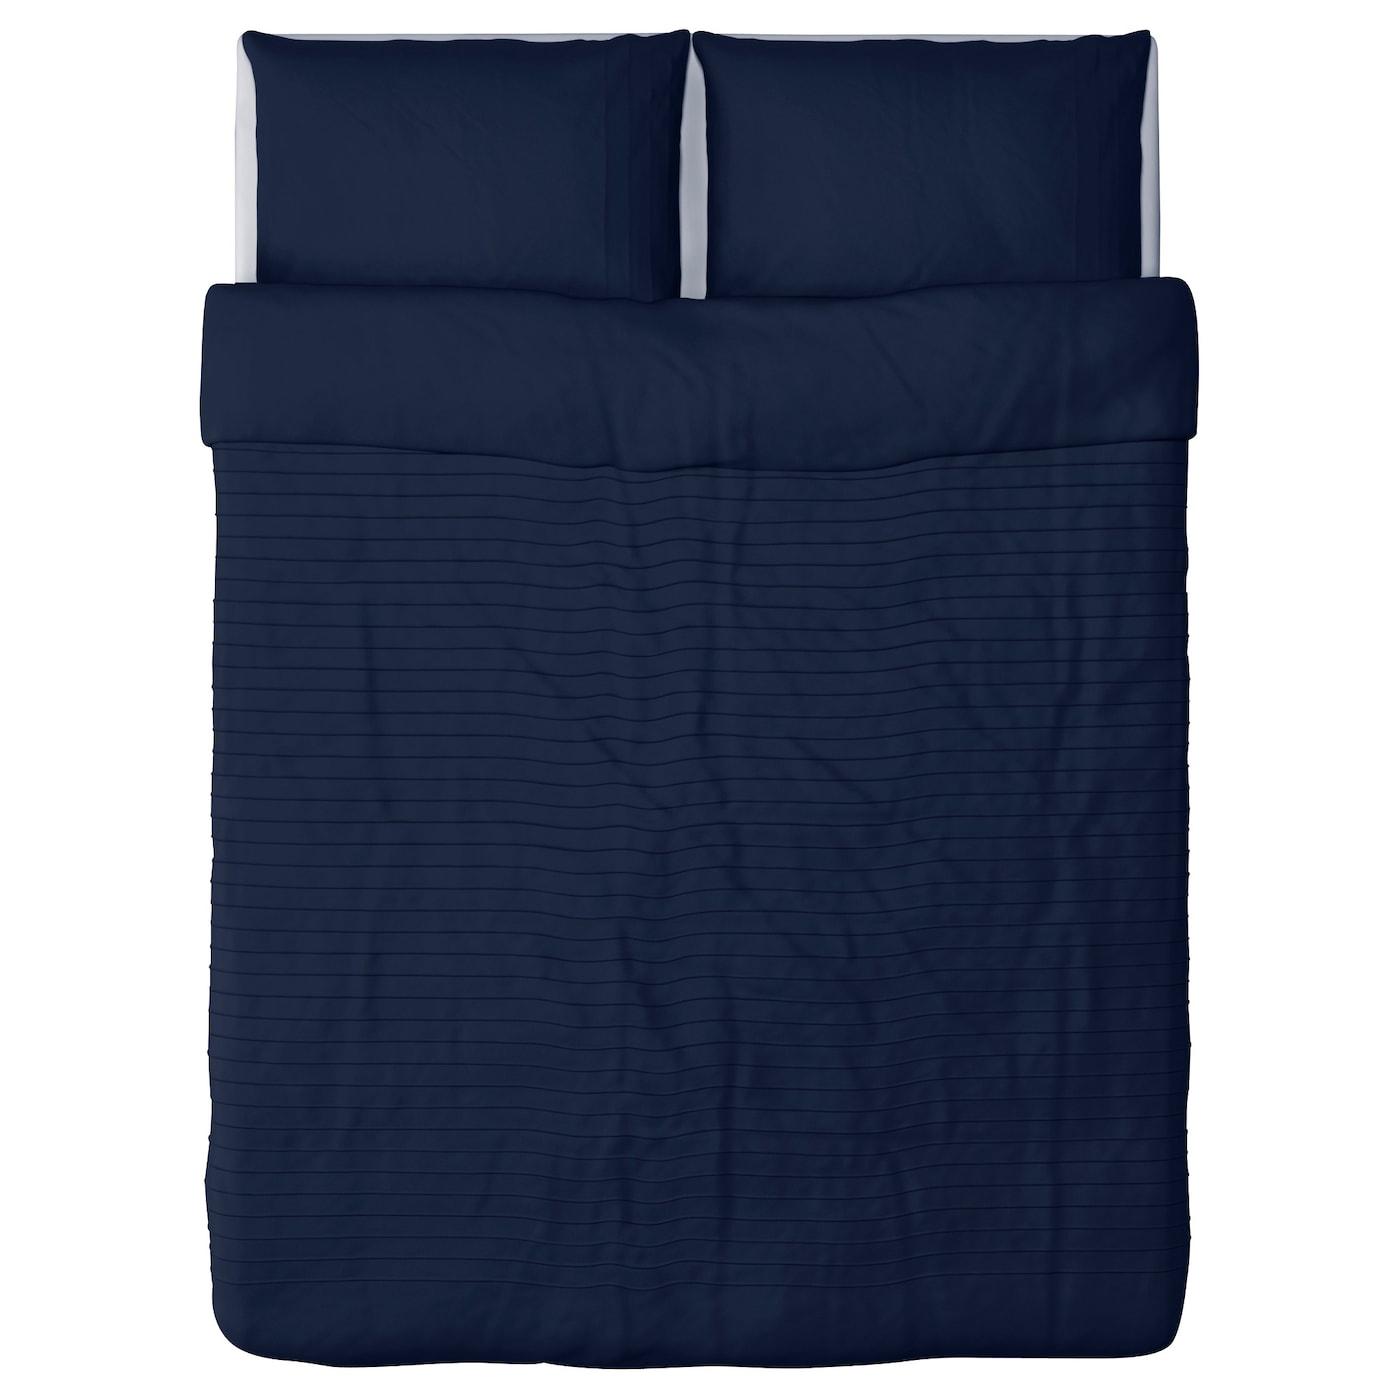 alvine str quilt cover and 2 pillowcases blue 200x200. Black Bedroom Furniture Sets. Home Design Ideas